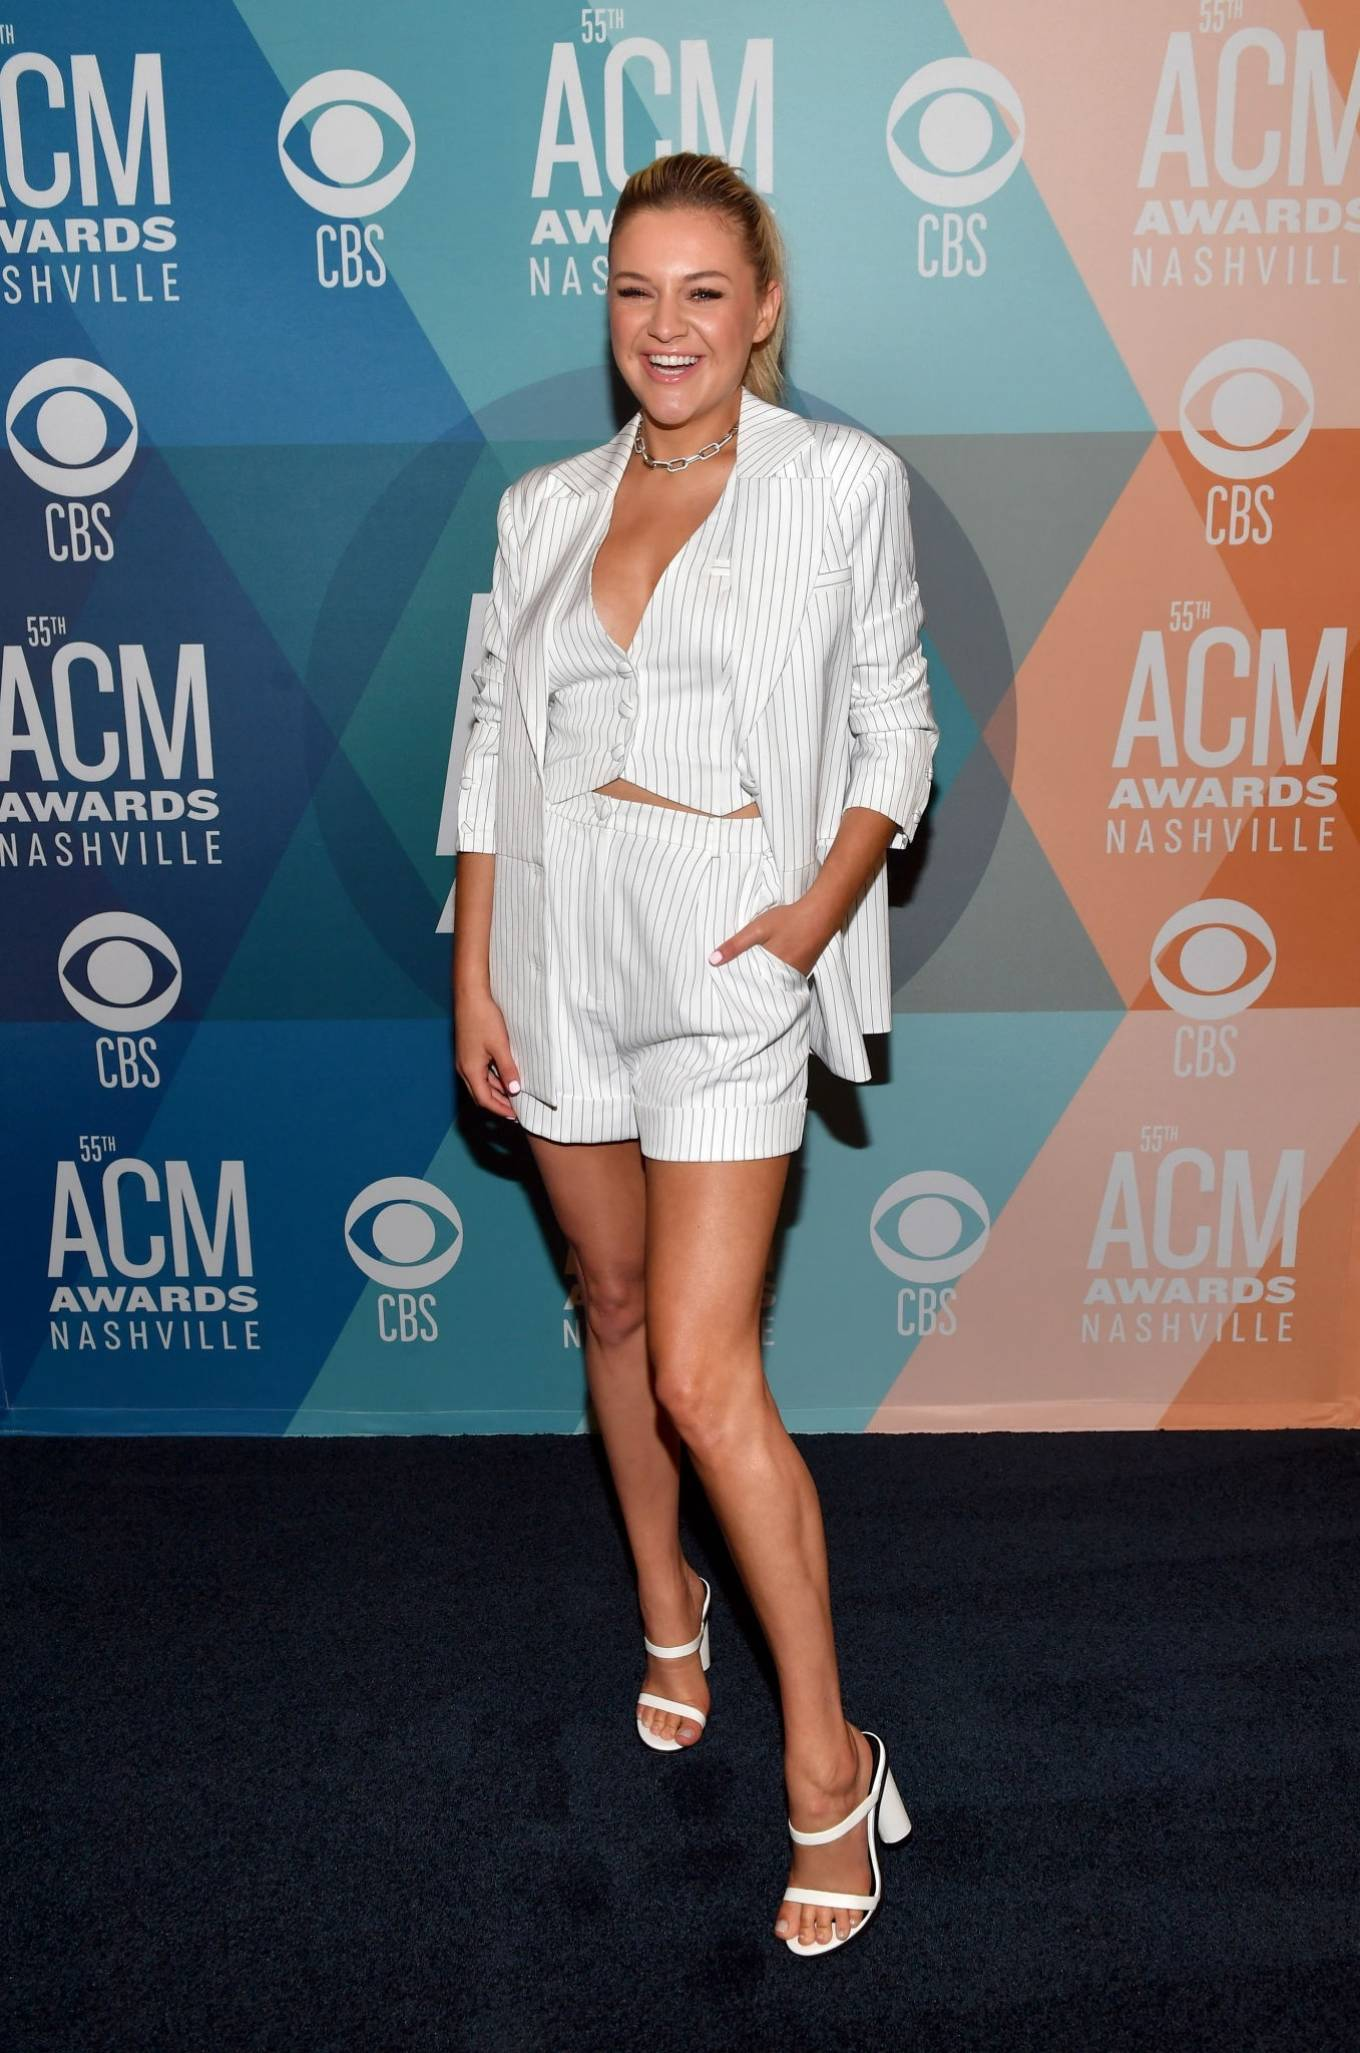 Kelsea Ballerini 2020 : Kelsea Ballerini – 2020 Academy Of Country Music Awards Virtual Radio Row in Nashville-07